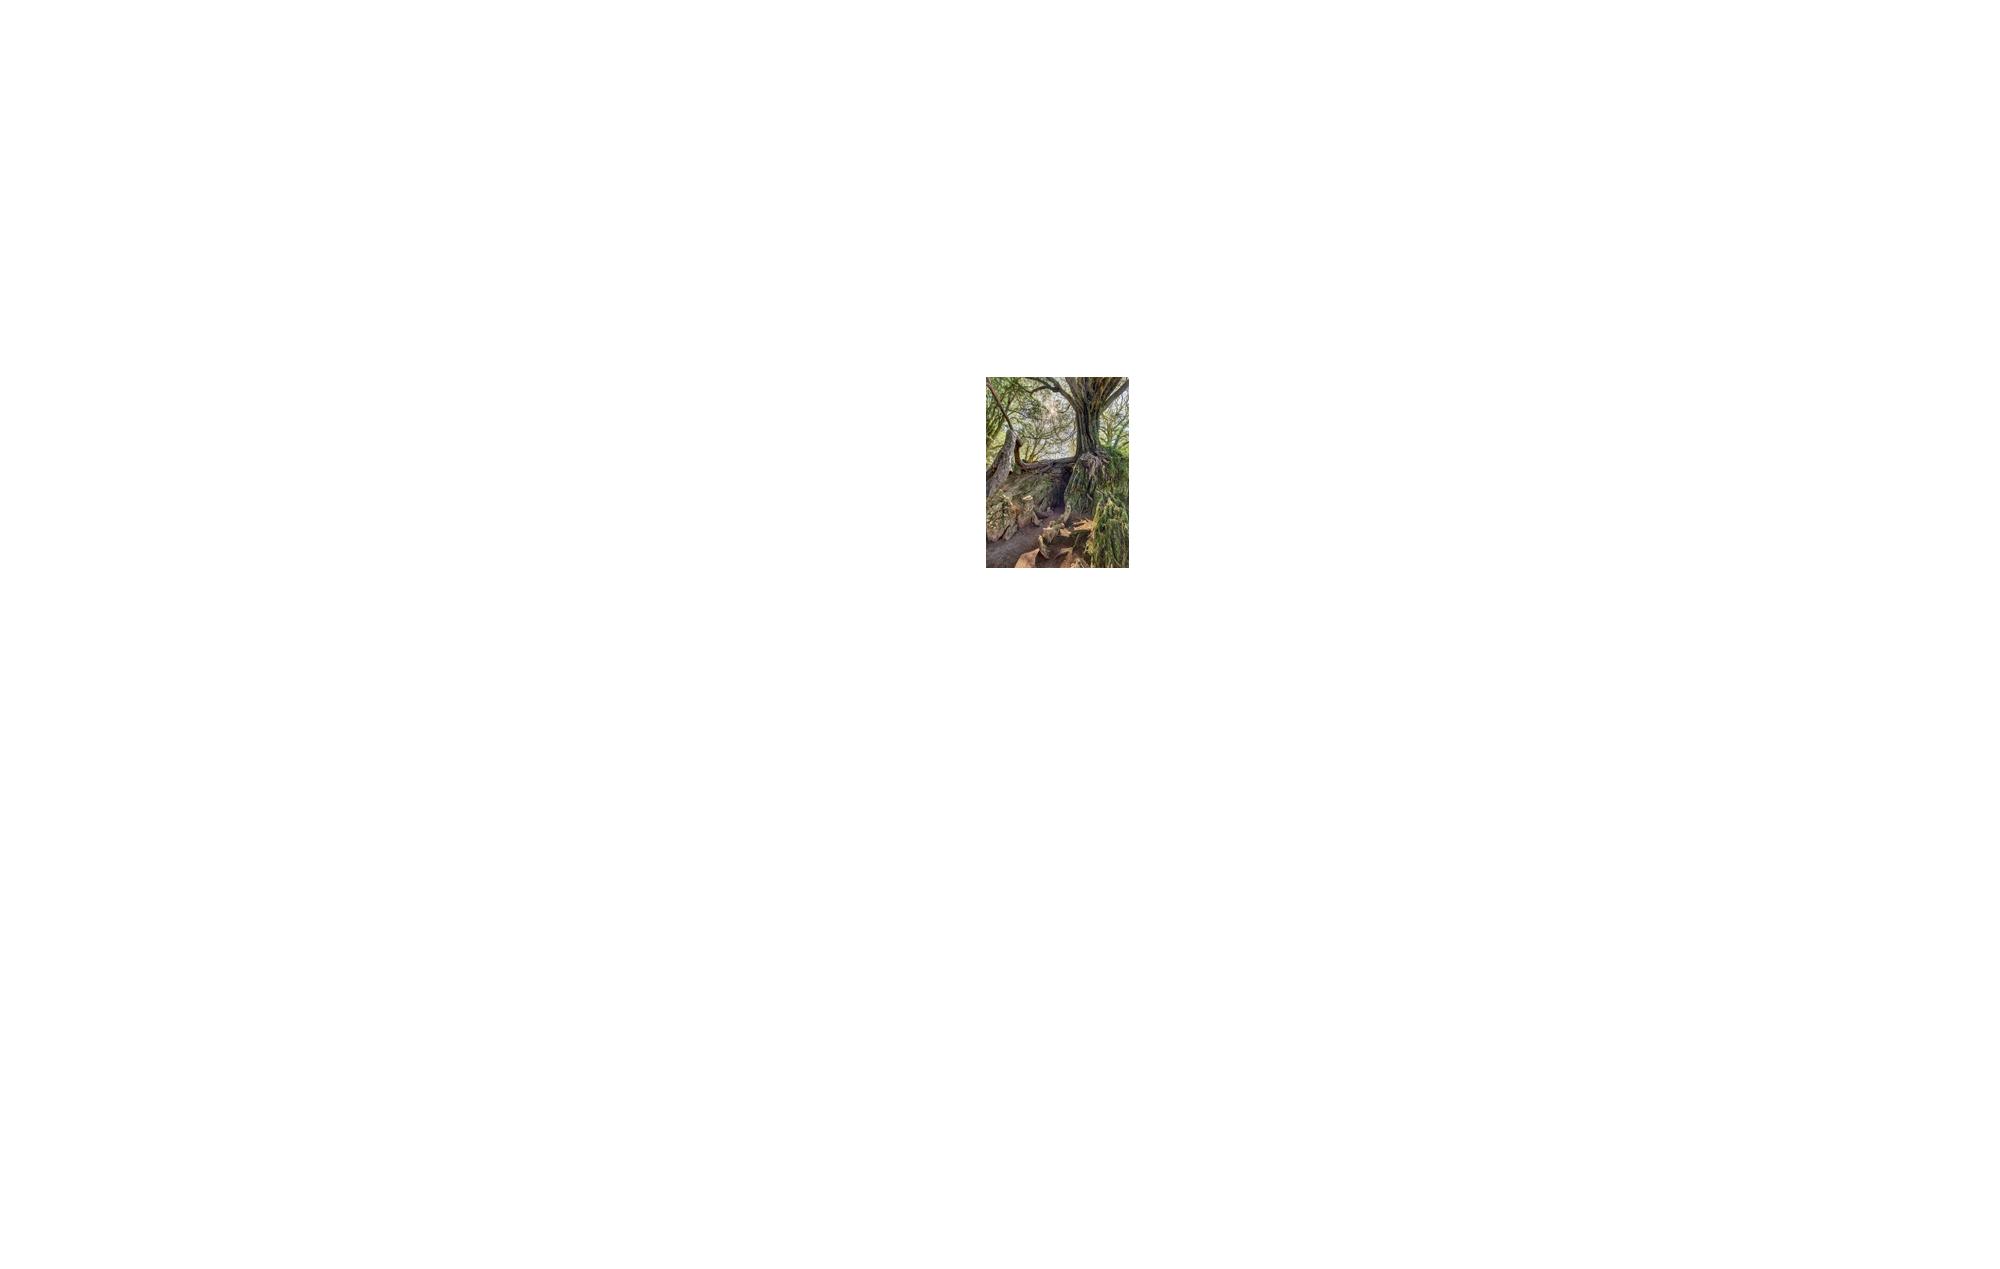 _efa-178-witches-kitchen-blarney-castle-cork-yew-trees-copy - Enda ...